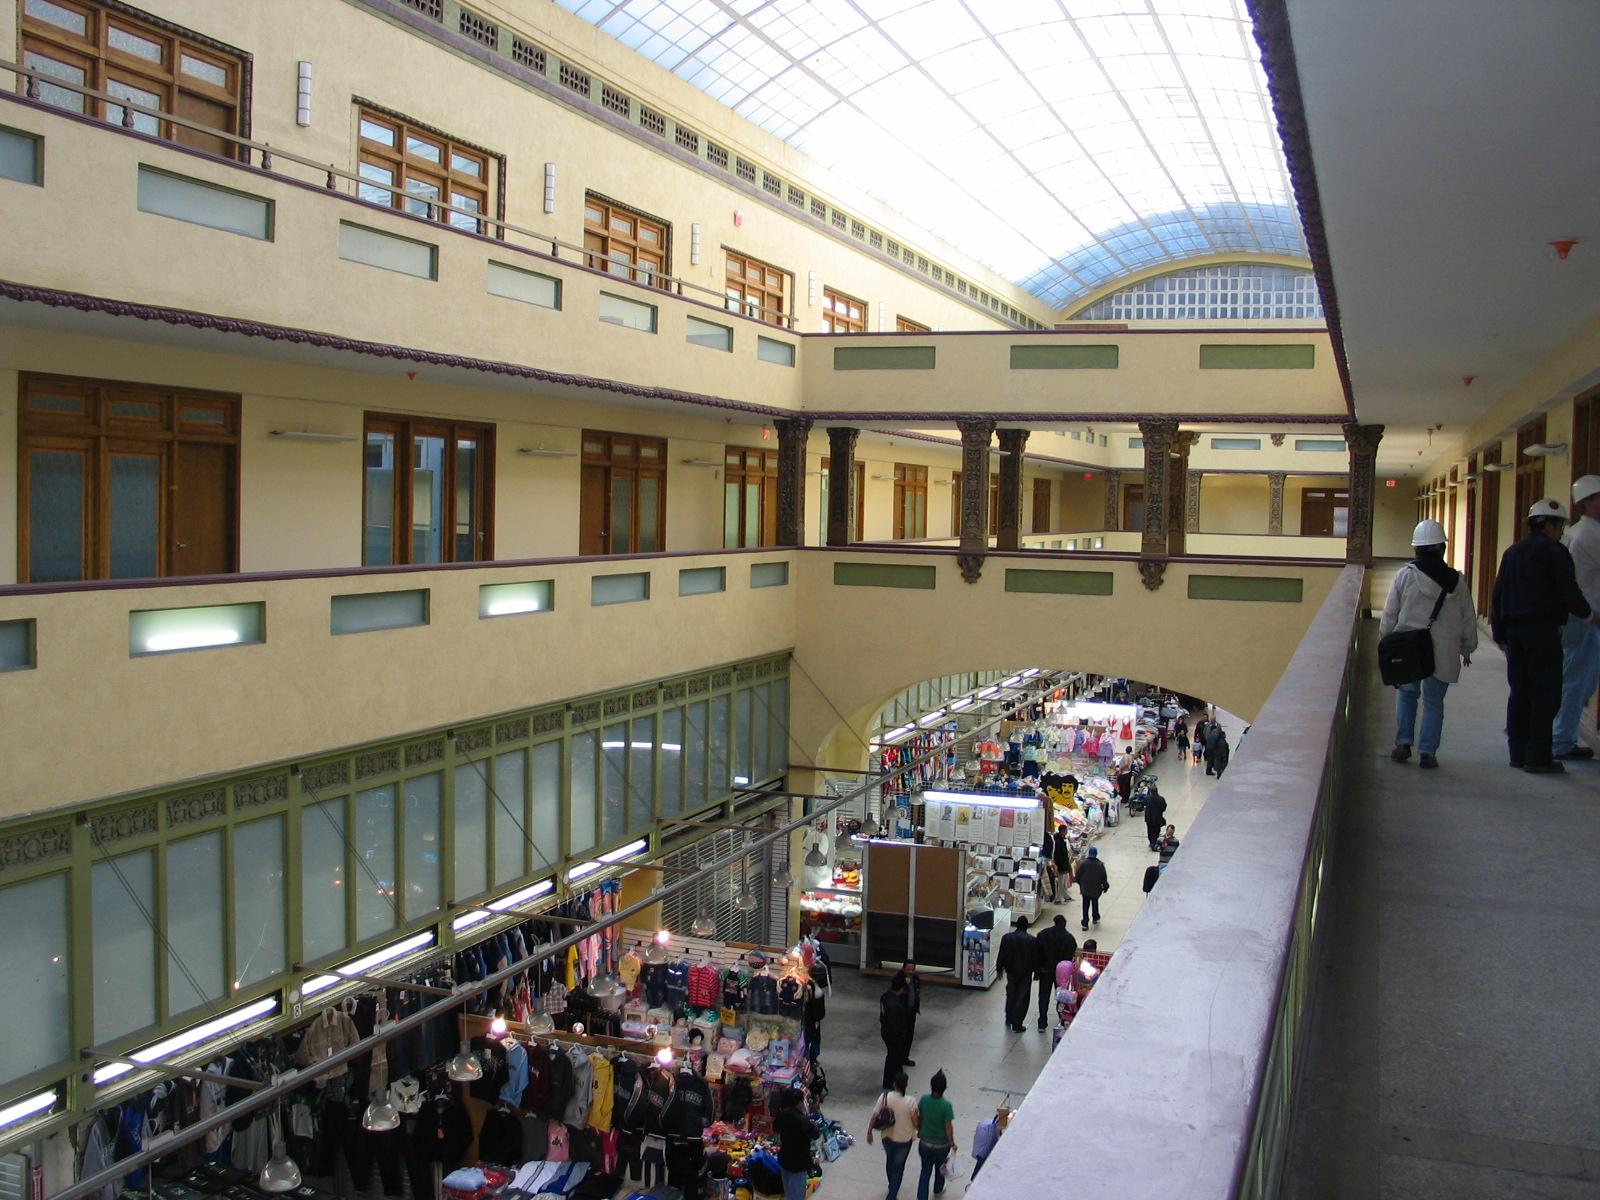 Arcade Building Seismic Retrofit